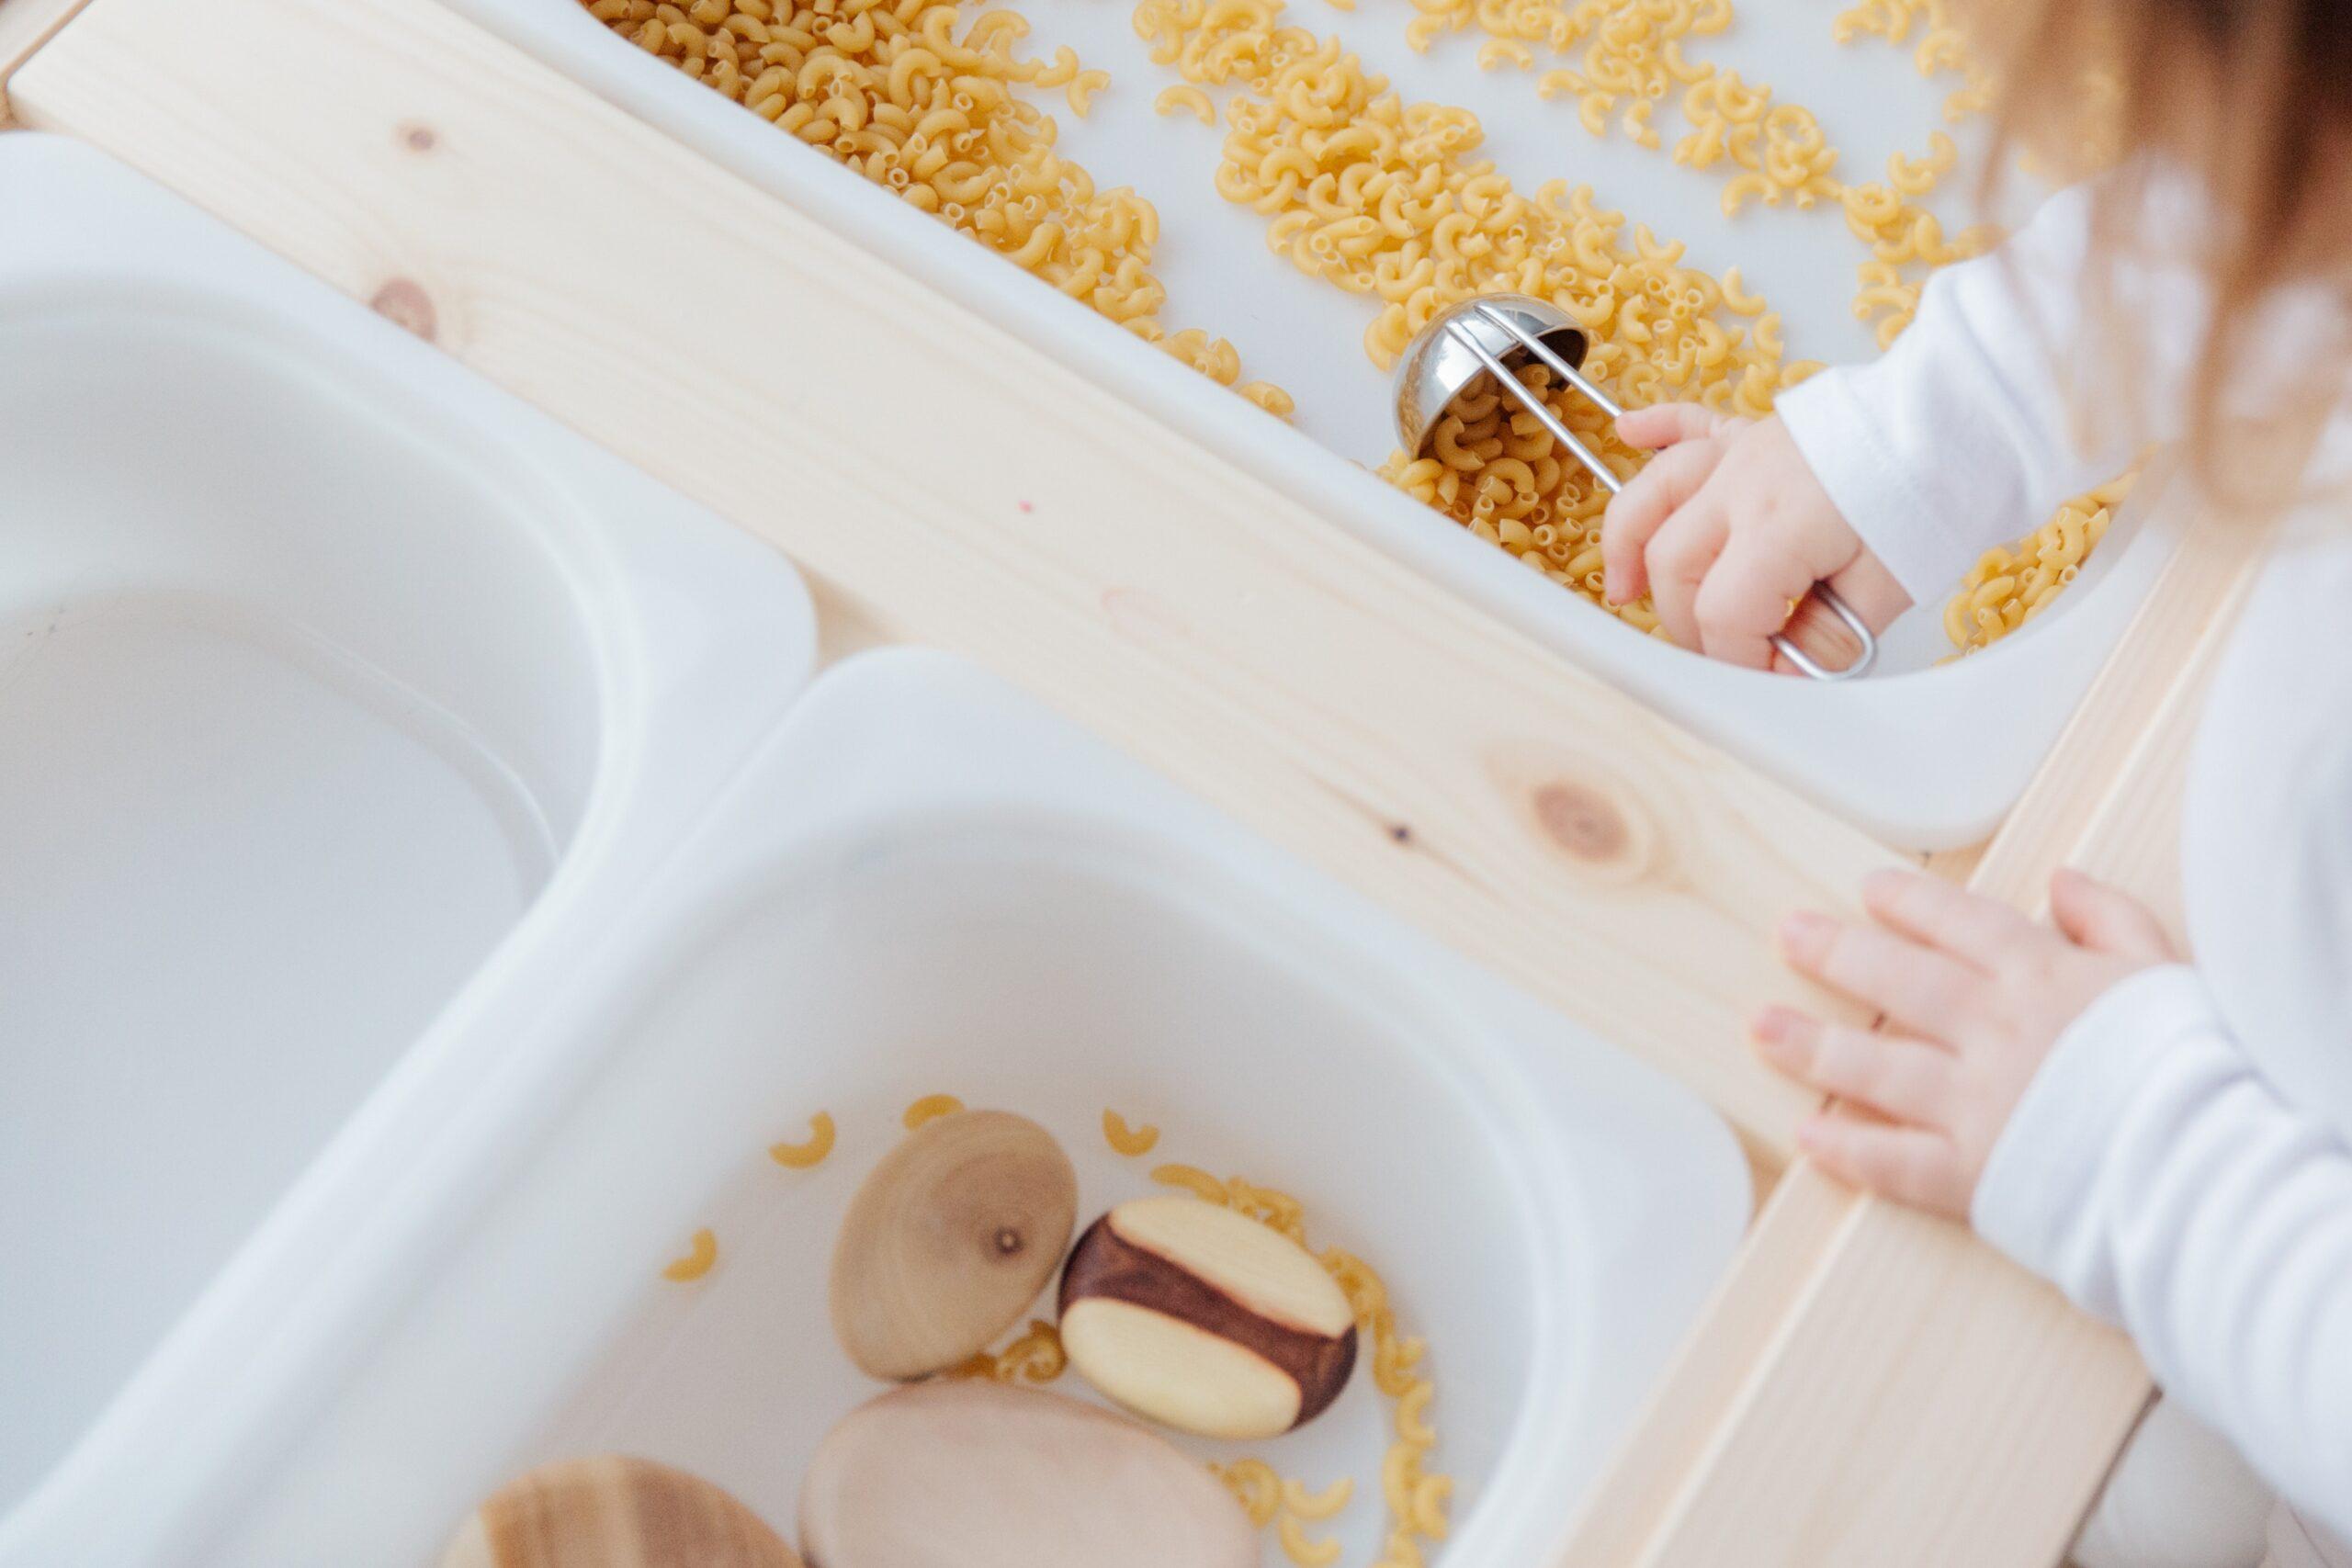 sensory bins with rice